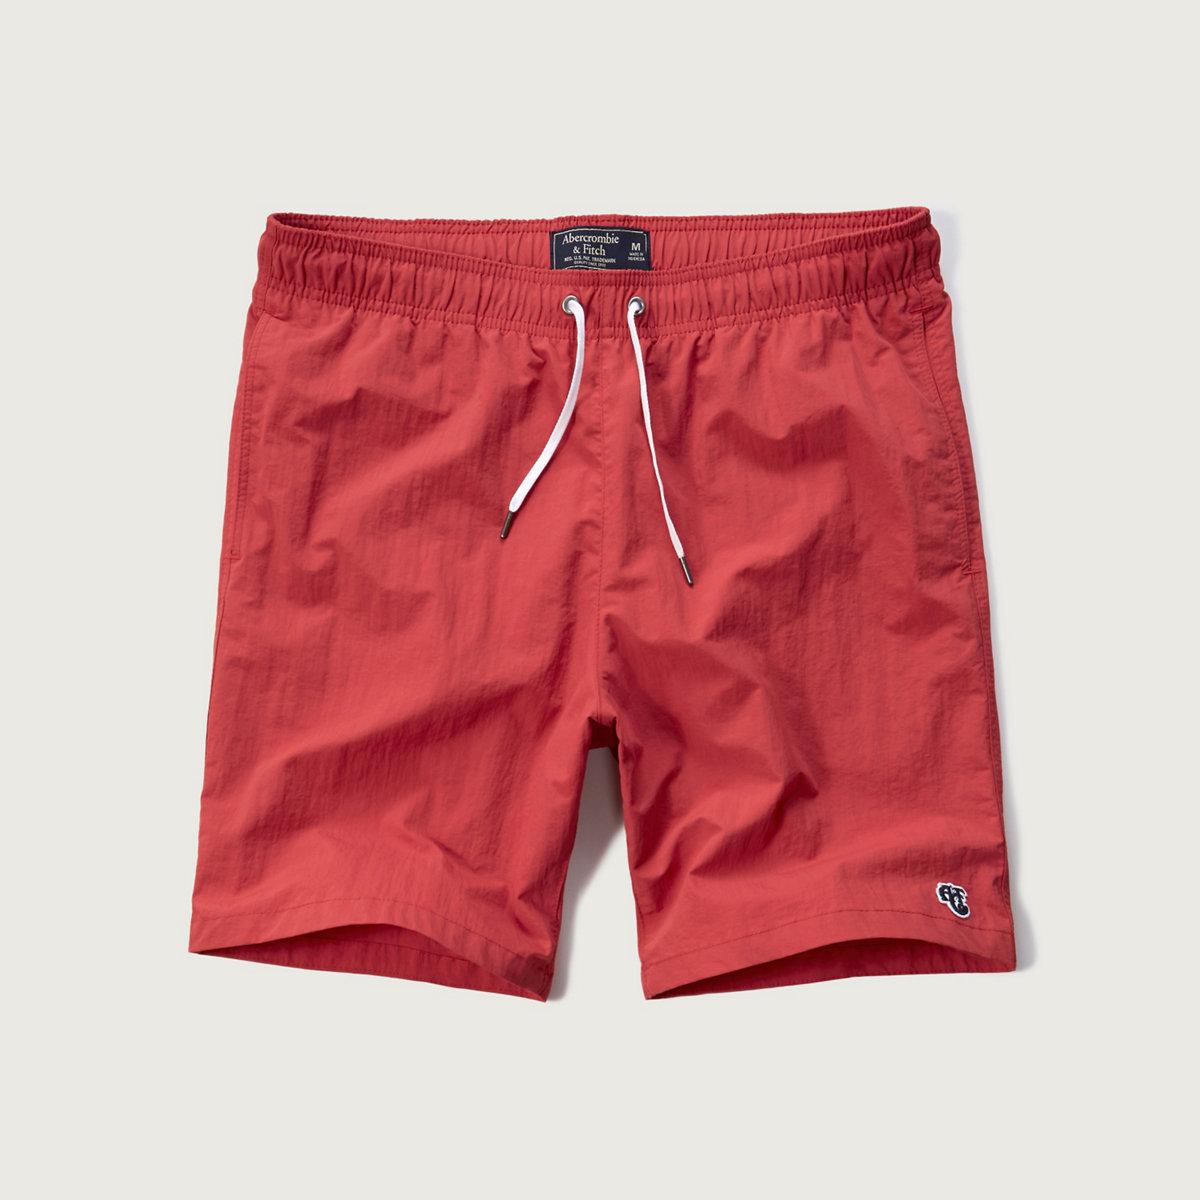 7'' Trunk Fit Swim Shorts